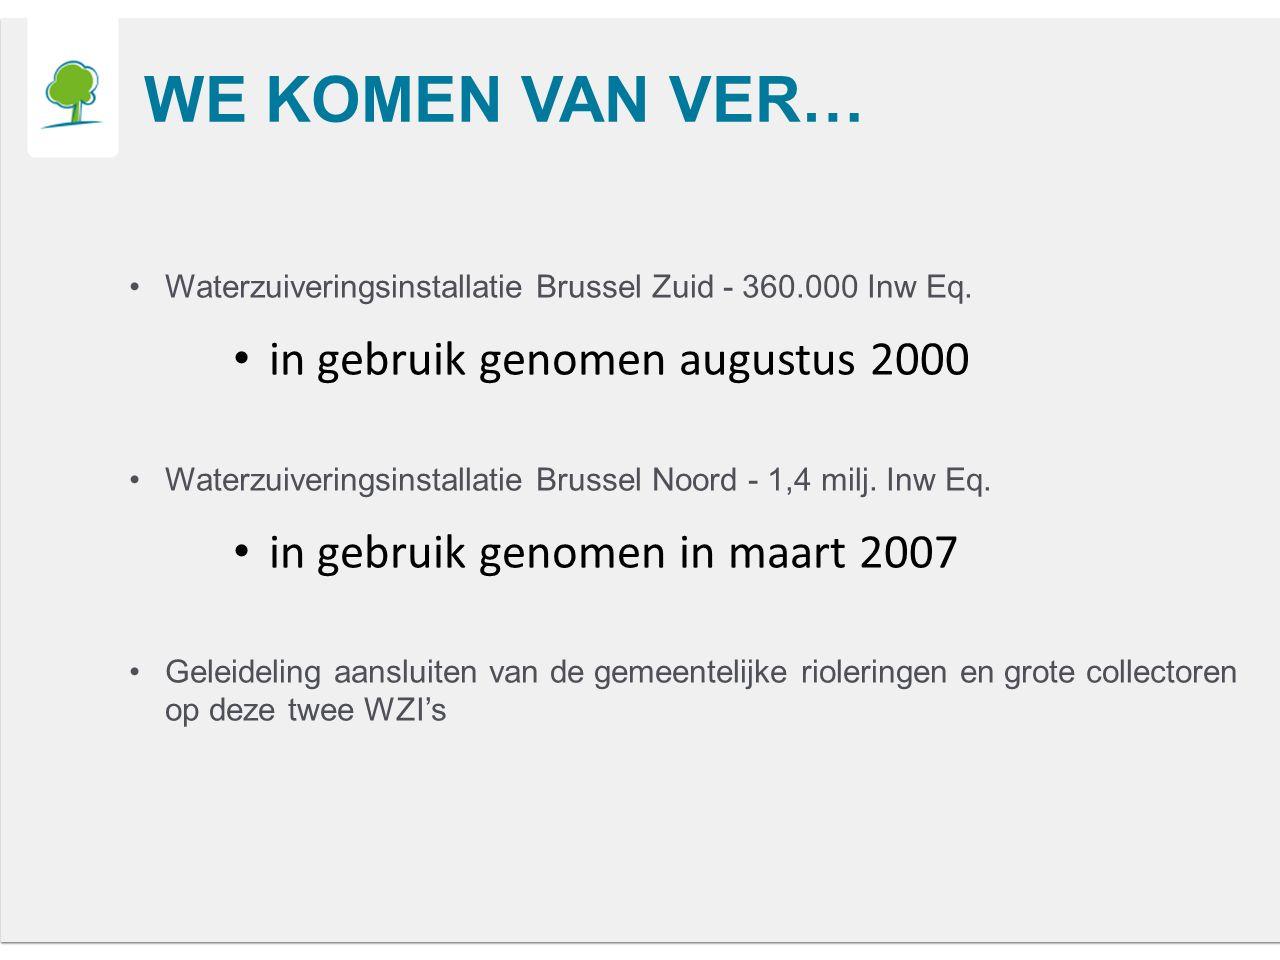 Waterzuiveringsinstallatie Brussel Zuid - 360.000 Inw Eq.